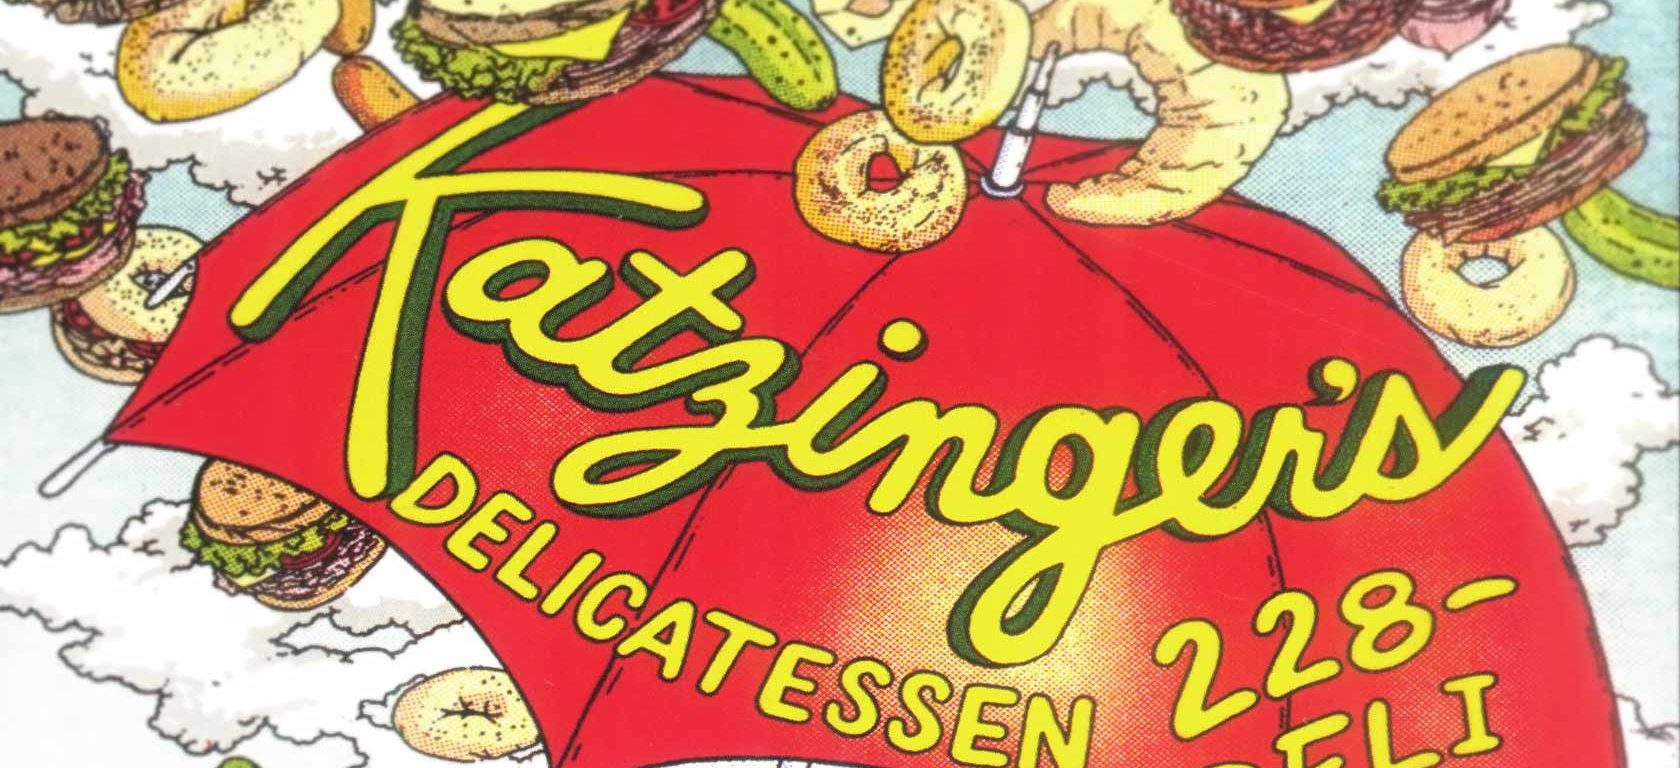 Katzinger's Delicatessen 228-DELI